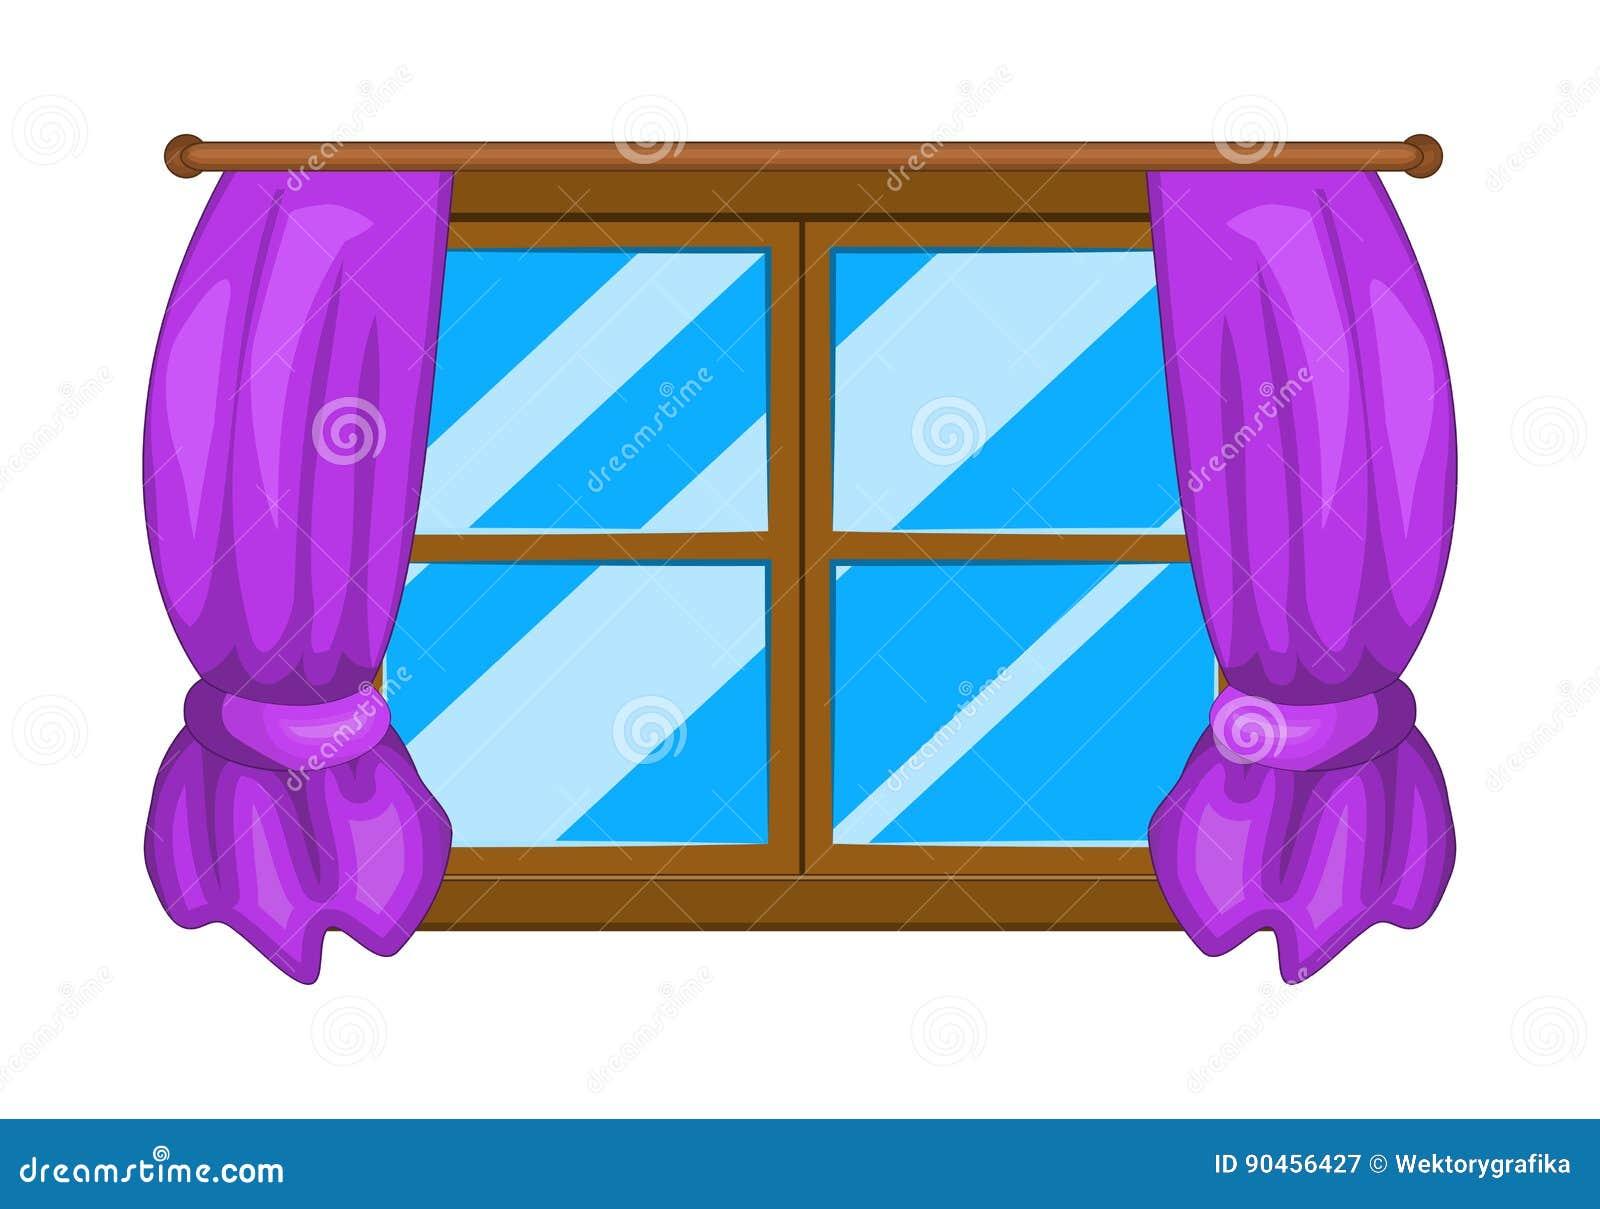 Cartoon Window With Curtains Vector Symbol Icon Design. Stock Vector ... for Window With Curtains Clipart  300lyp